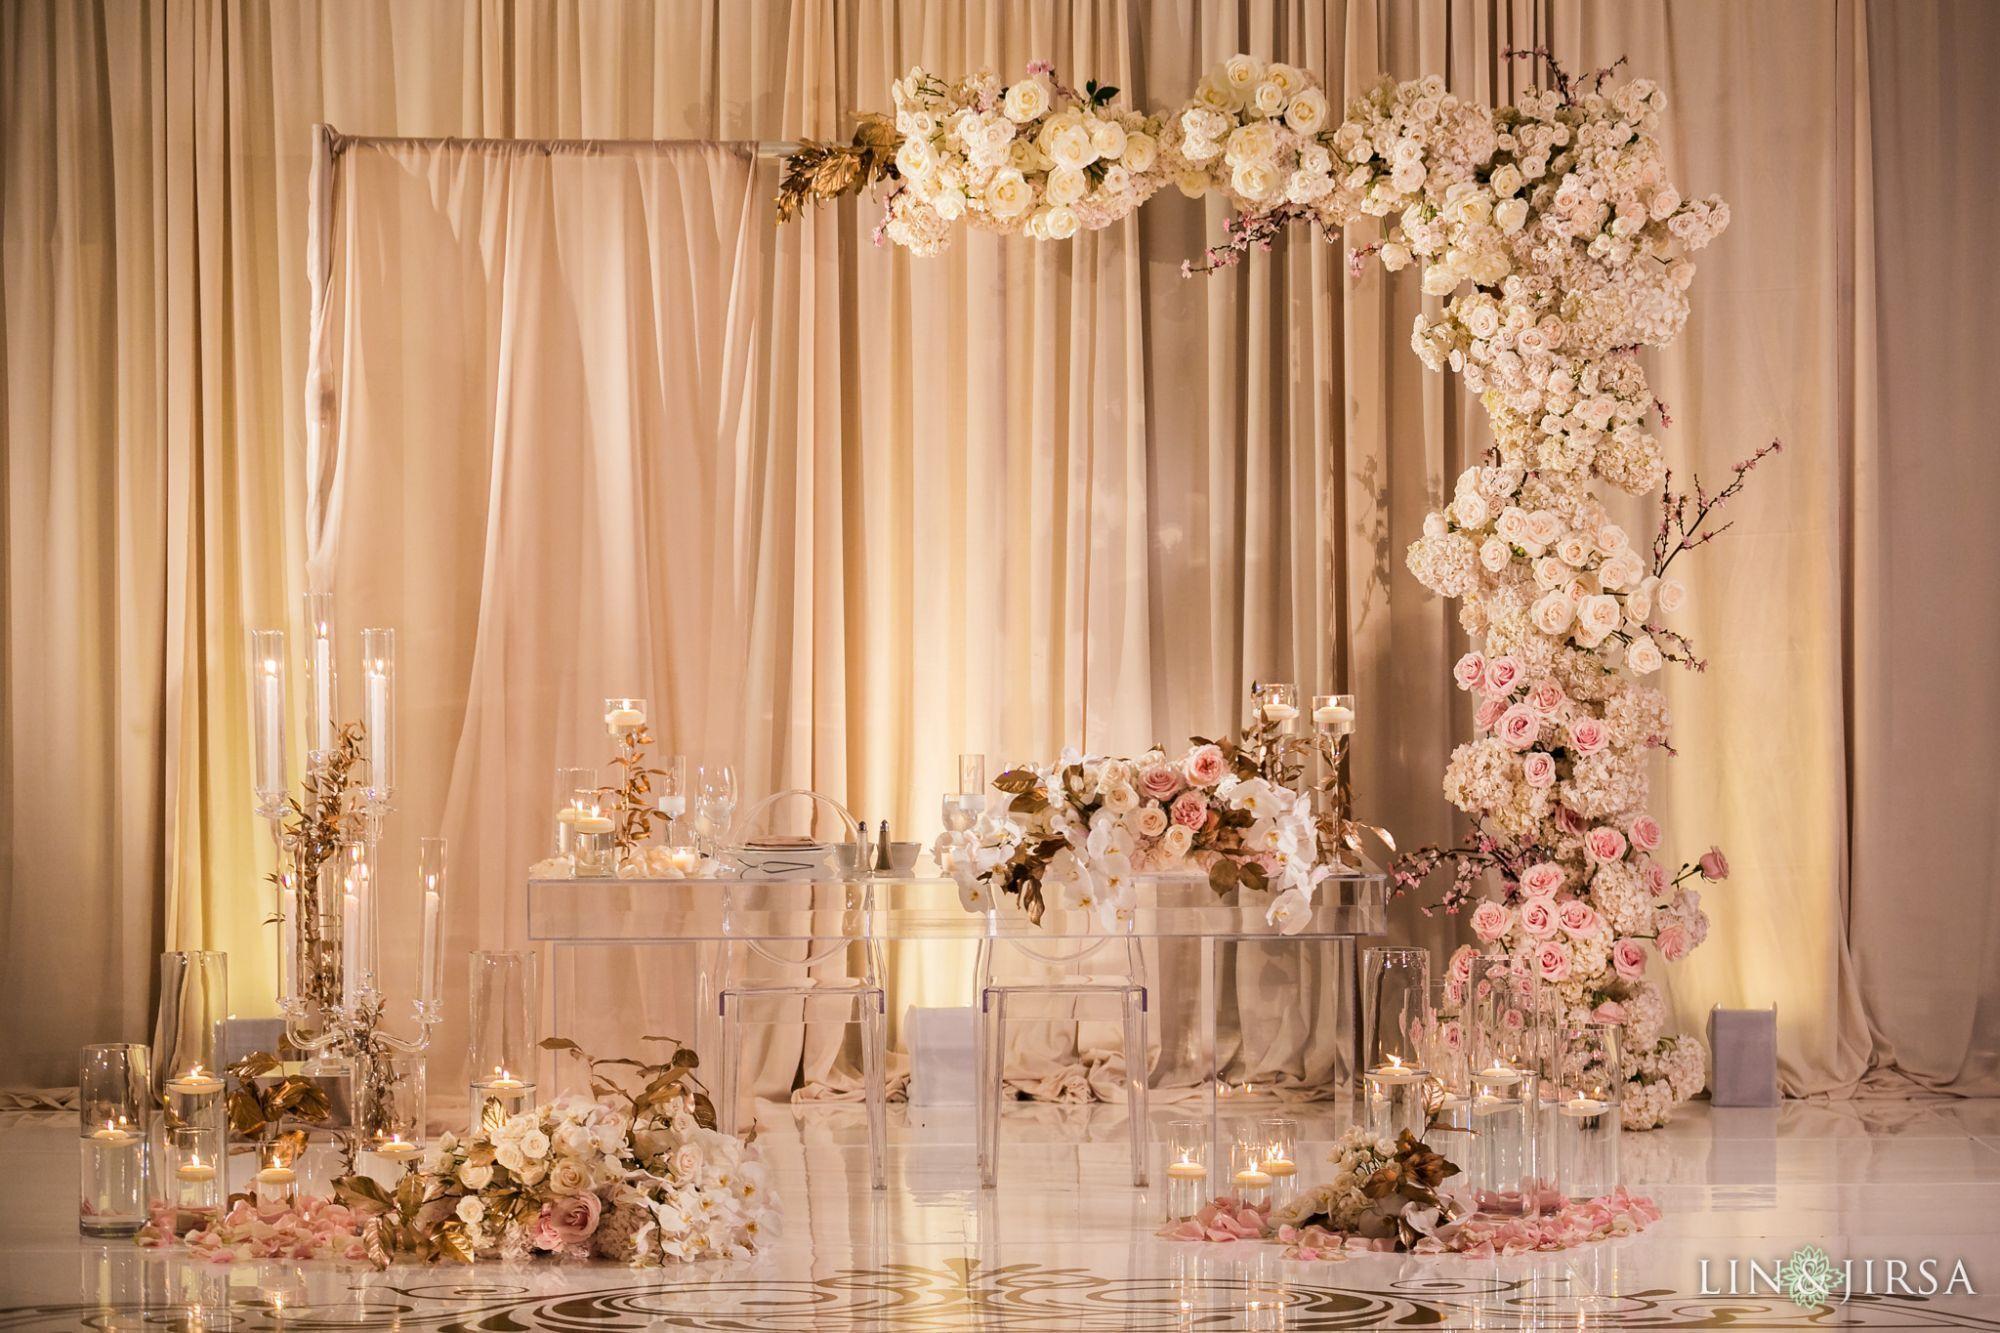 Wedding Konsept 15 Hilton Costa Mesa Orange County Wedding Reception Photog In 2020 Wedding Backdrop Decorations Minimalist Wedding Reception Wedding Stage Decorations